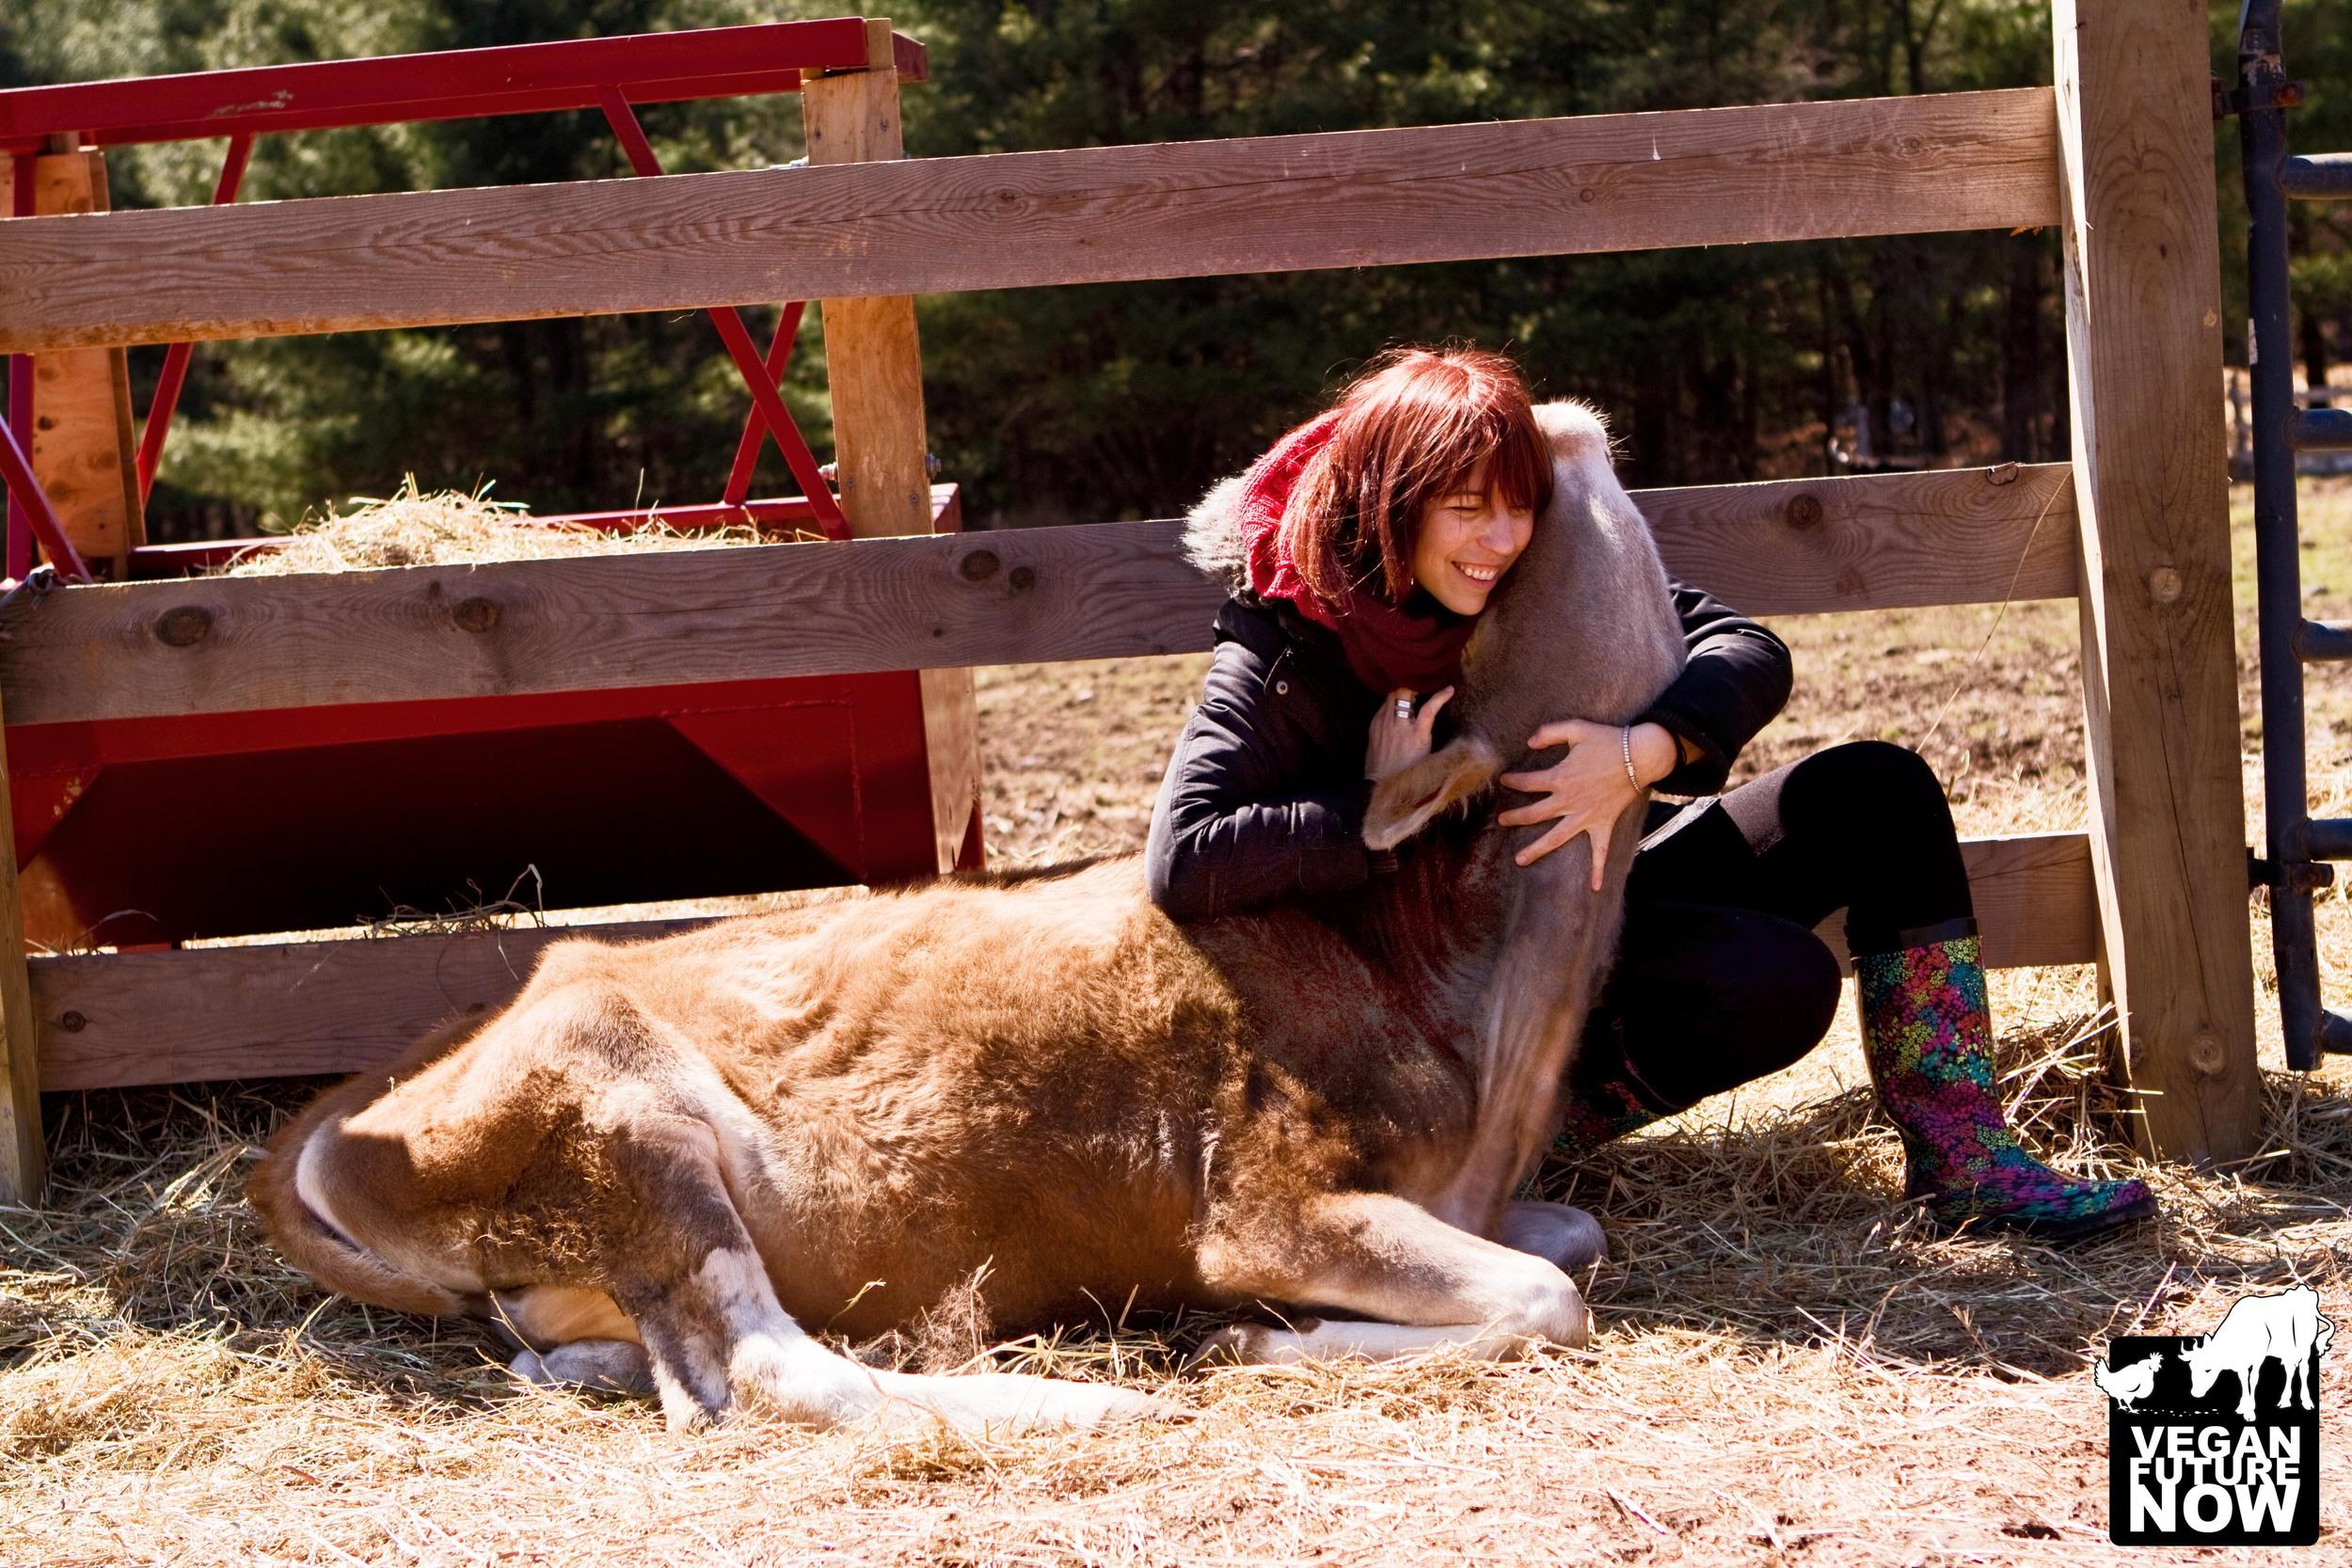 Photo taken at the Woodstock Farm Animal Sanctuary in Willow, New York